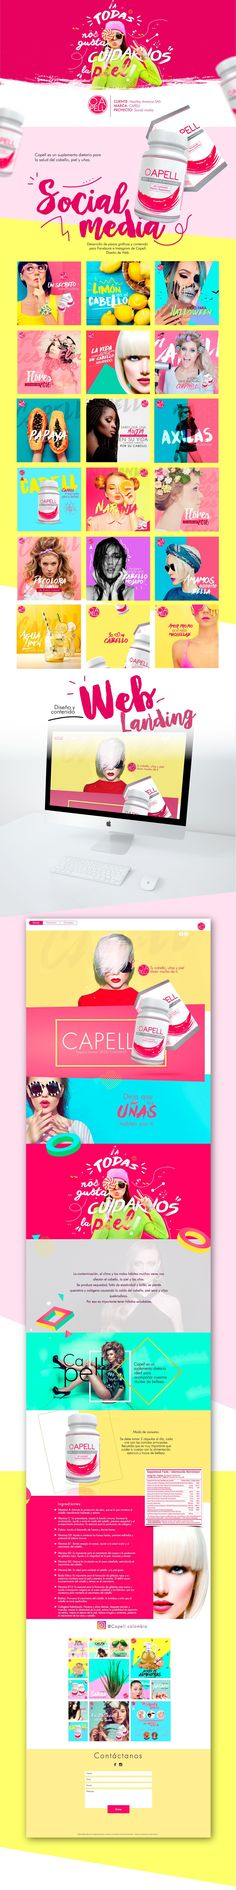 Capell Skin Hair and Nails - Social media & Design on Behance #socialmedia